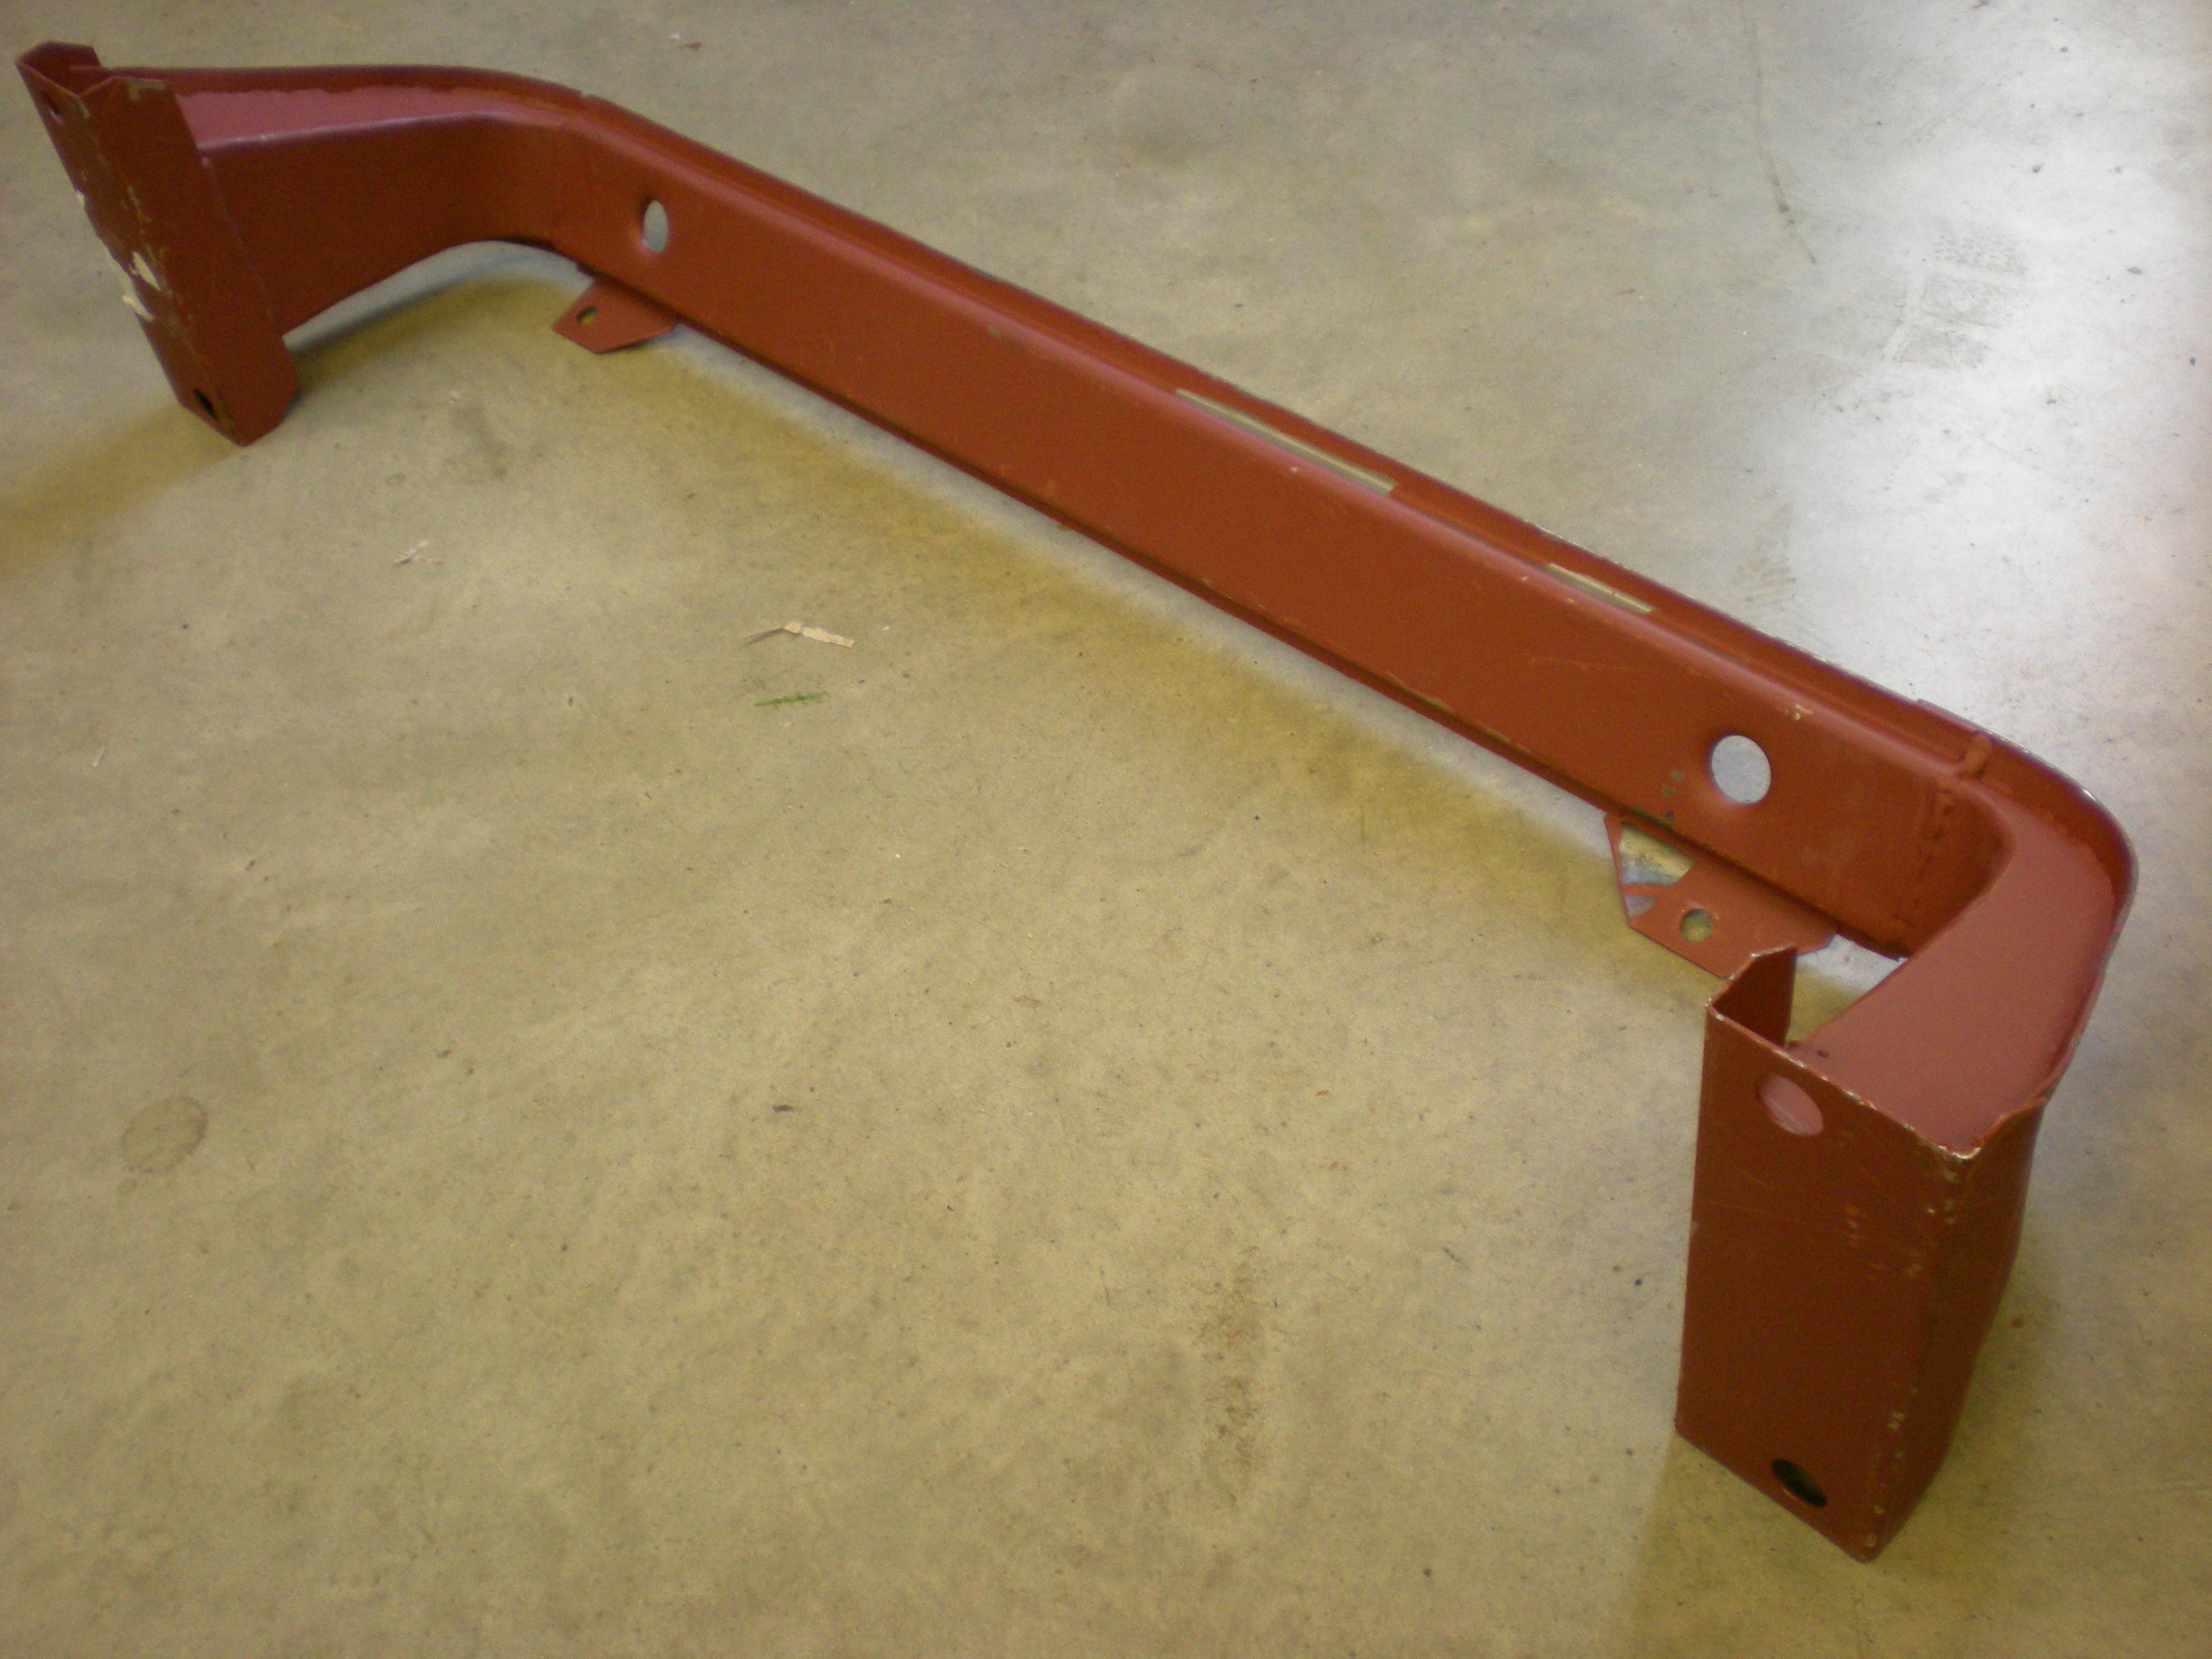 Lower radiator mount bracket